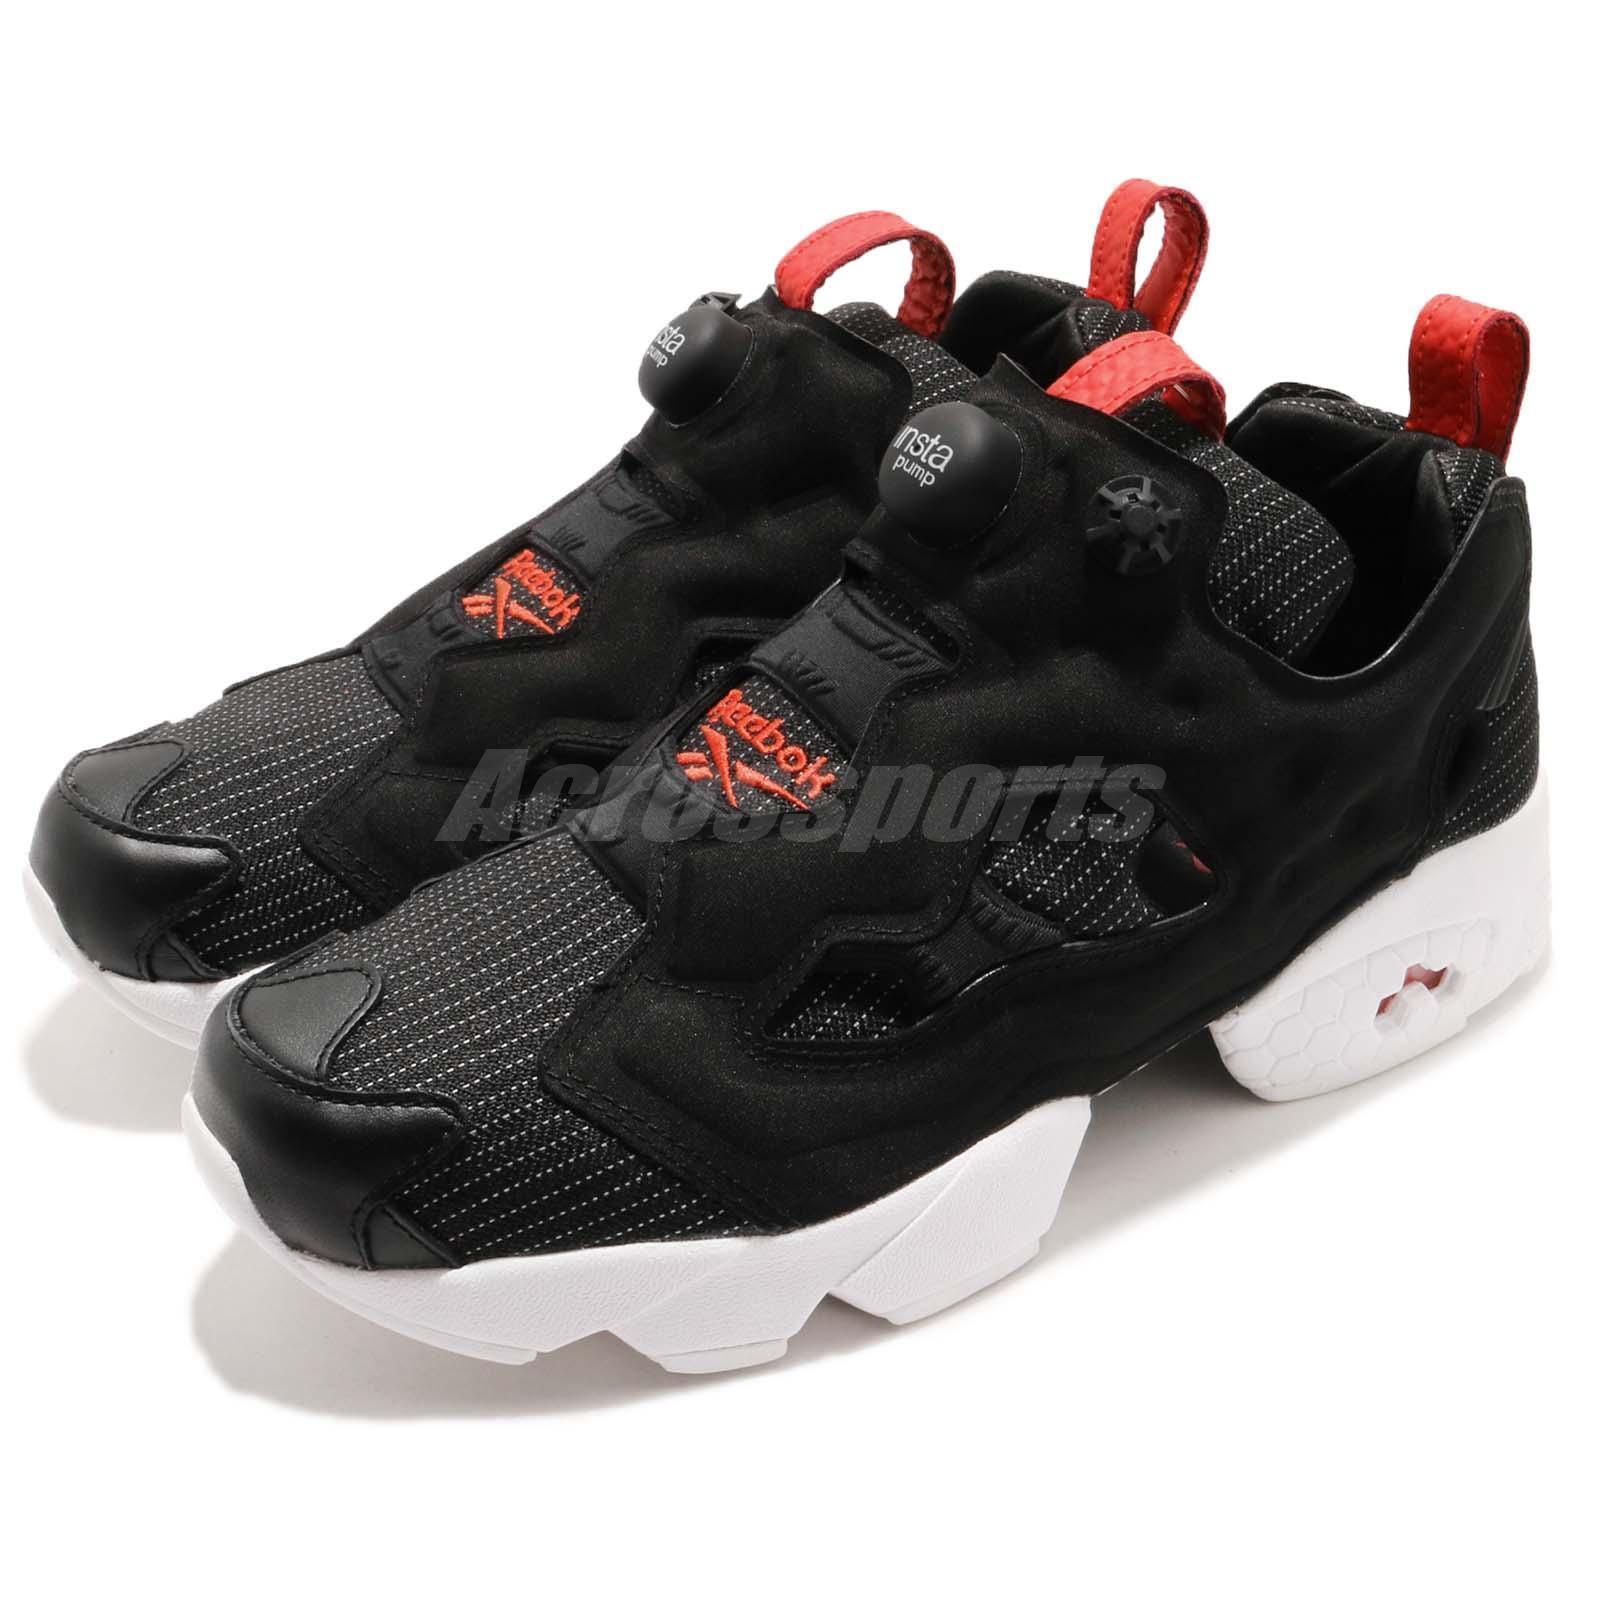 Reebok Instapump Fury MU     Pack Black Red White   Shoes Sneakers DV4590 | Stocker  6123eb